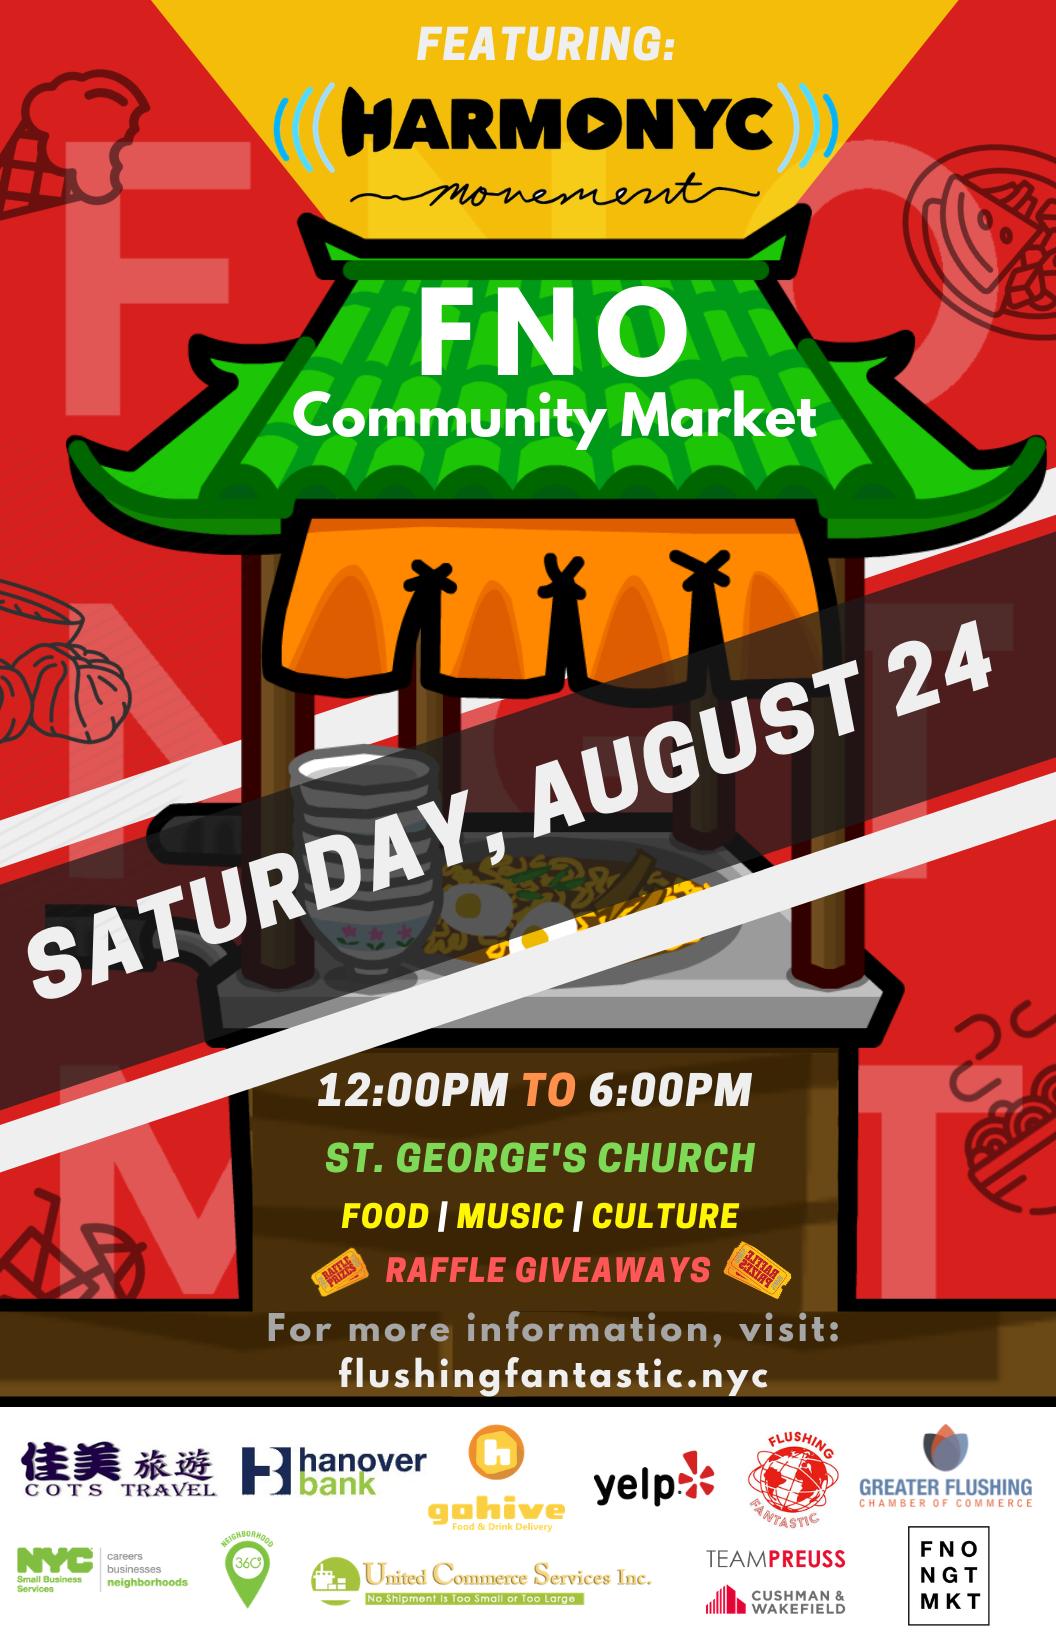 FNO 2019 Community Market